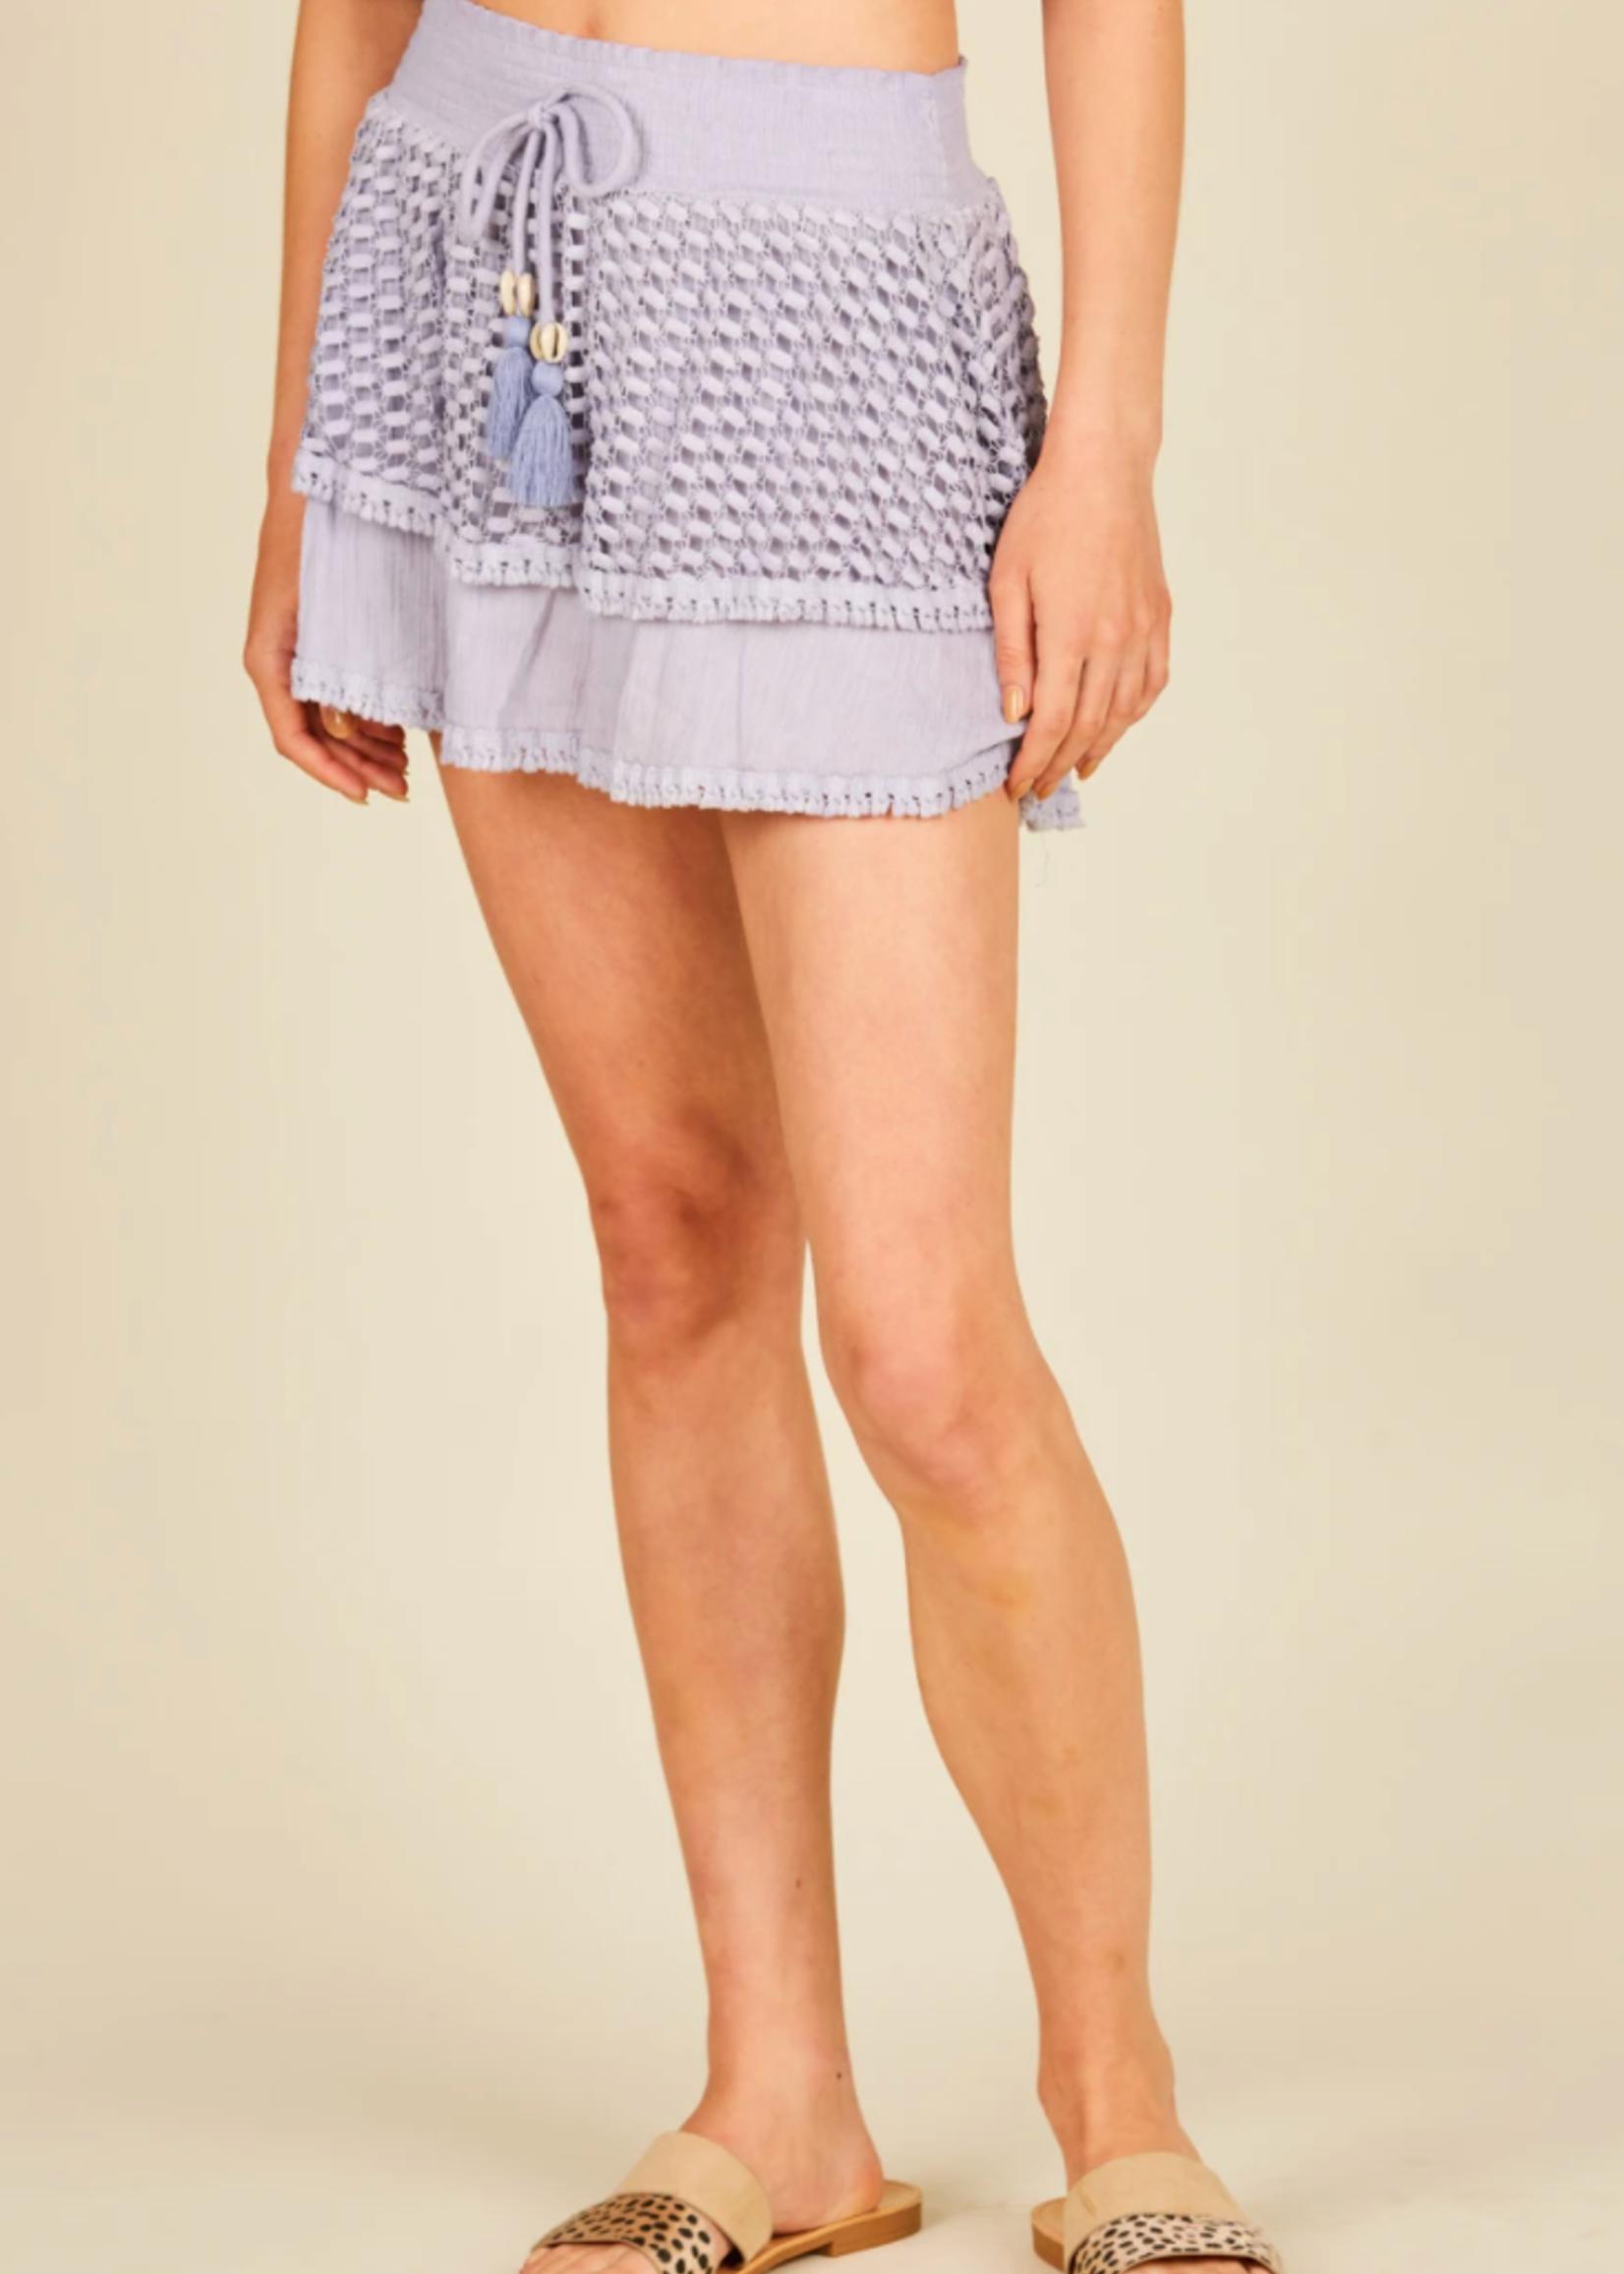 Surf Gypsy Dusty Lavender Layer Skirt